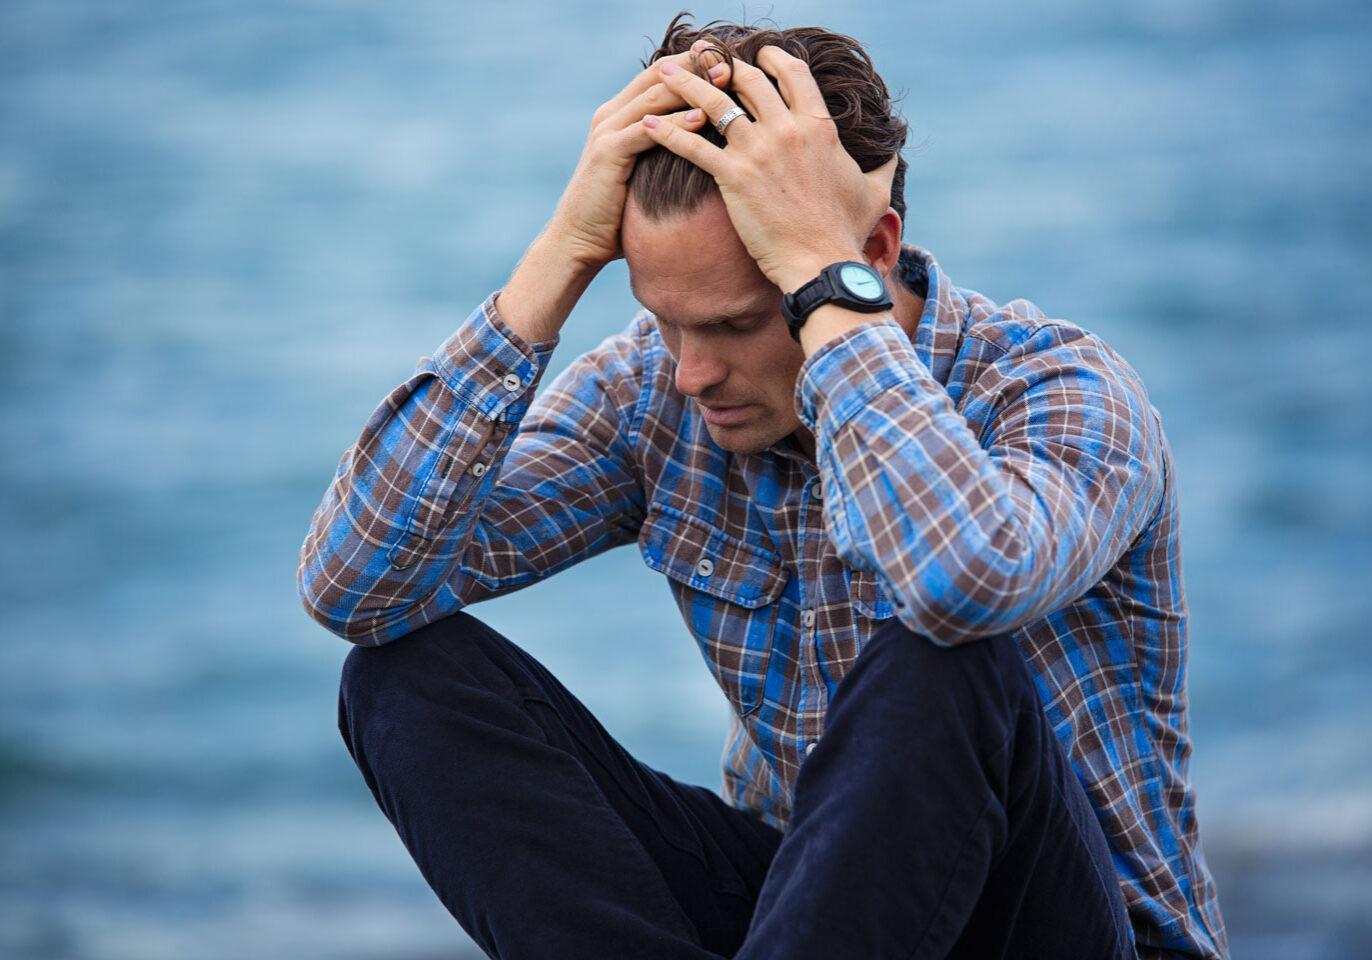 Man upset on dock overlooking a lake